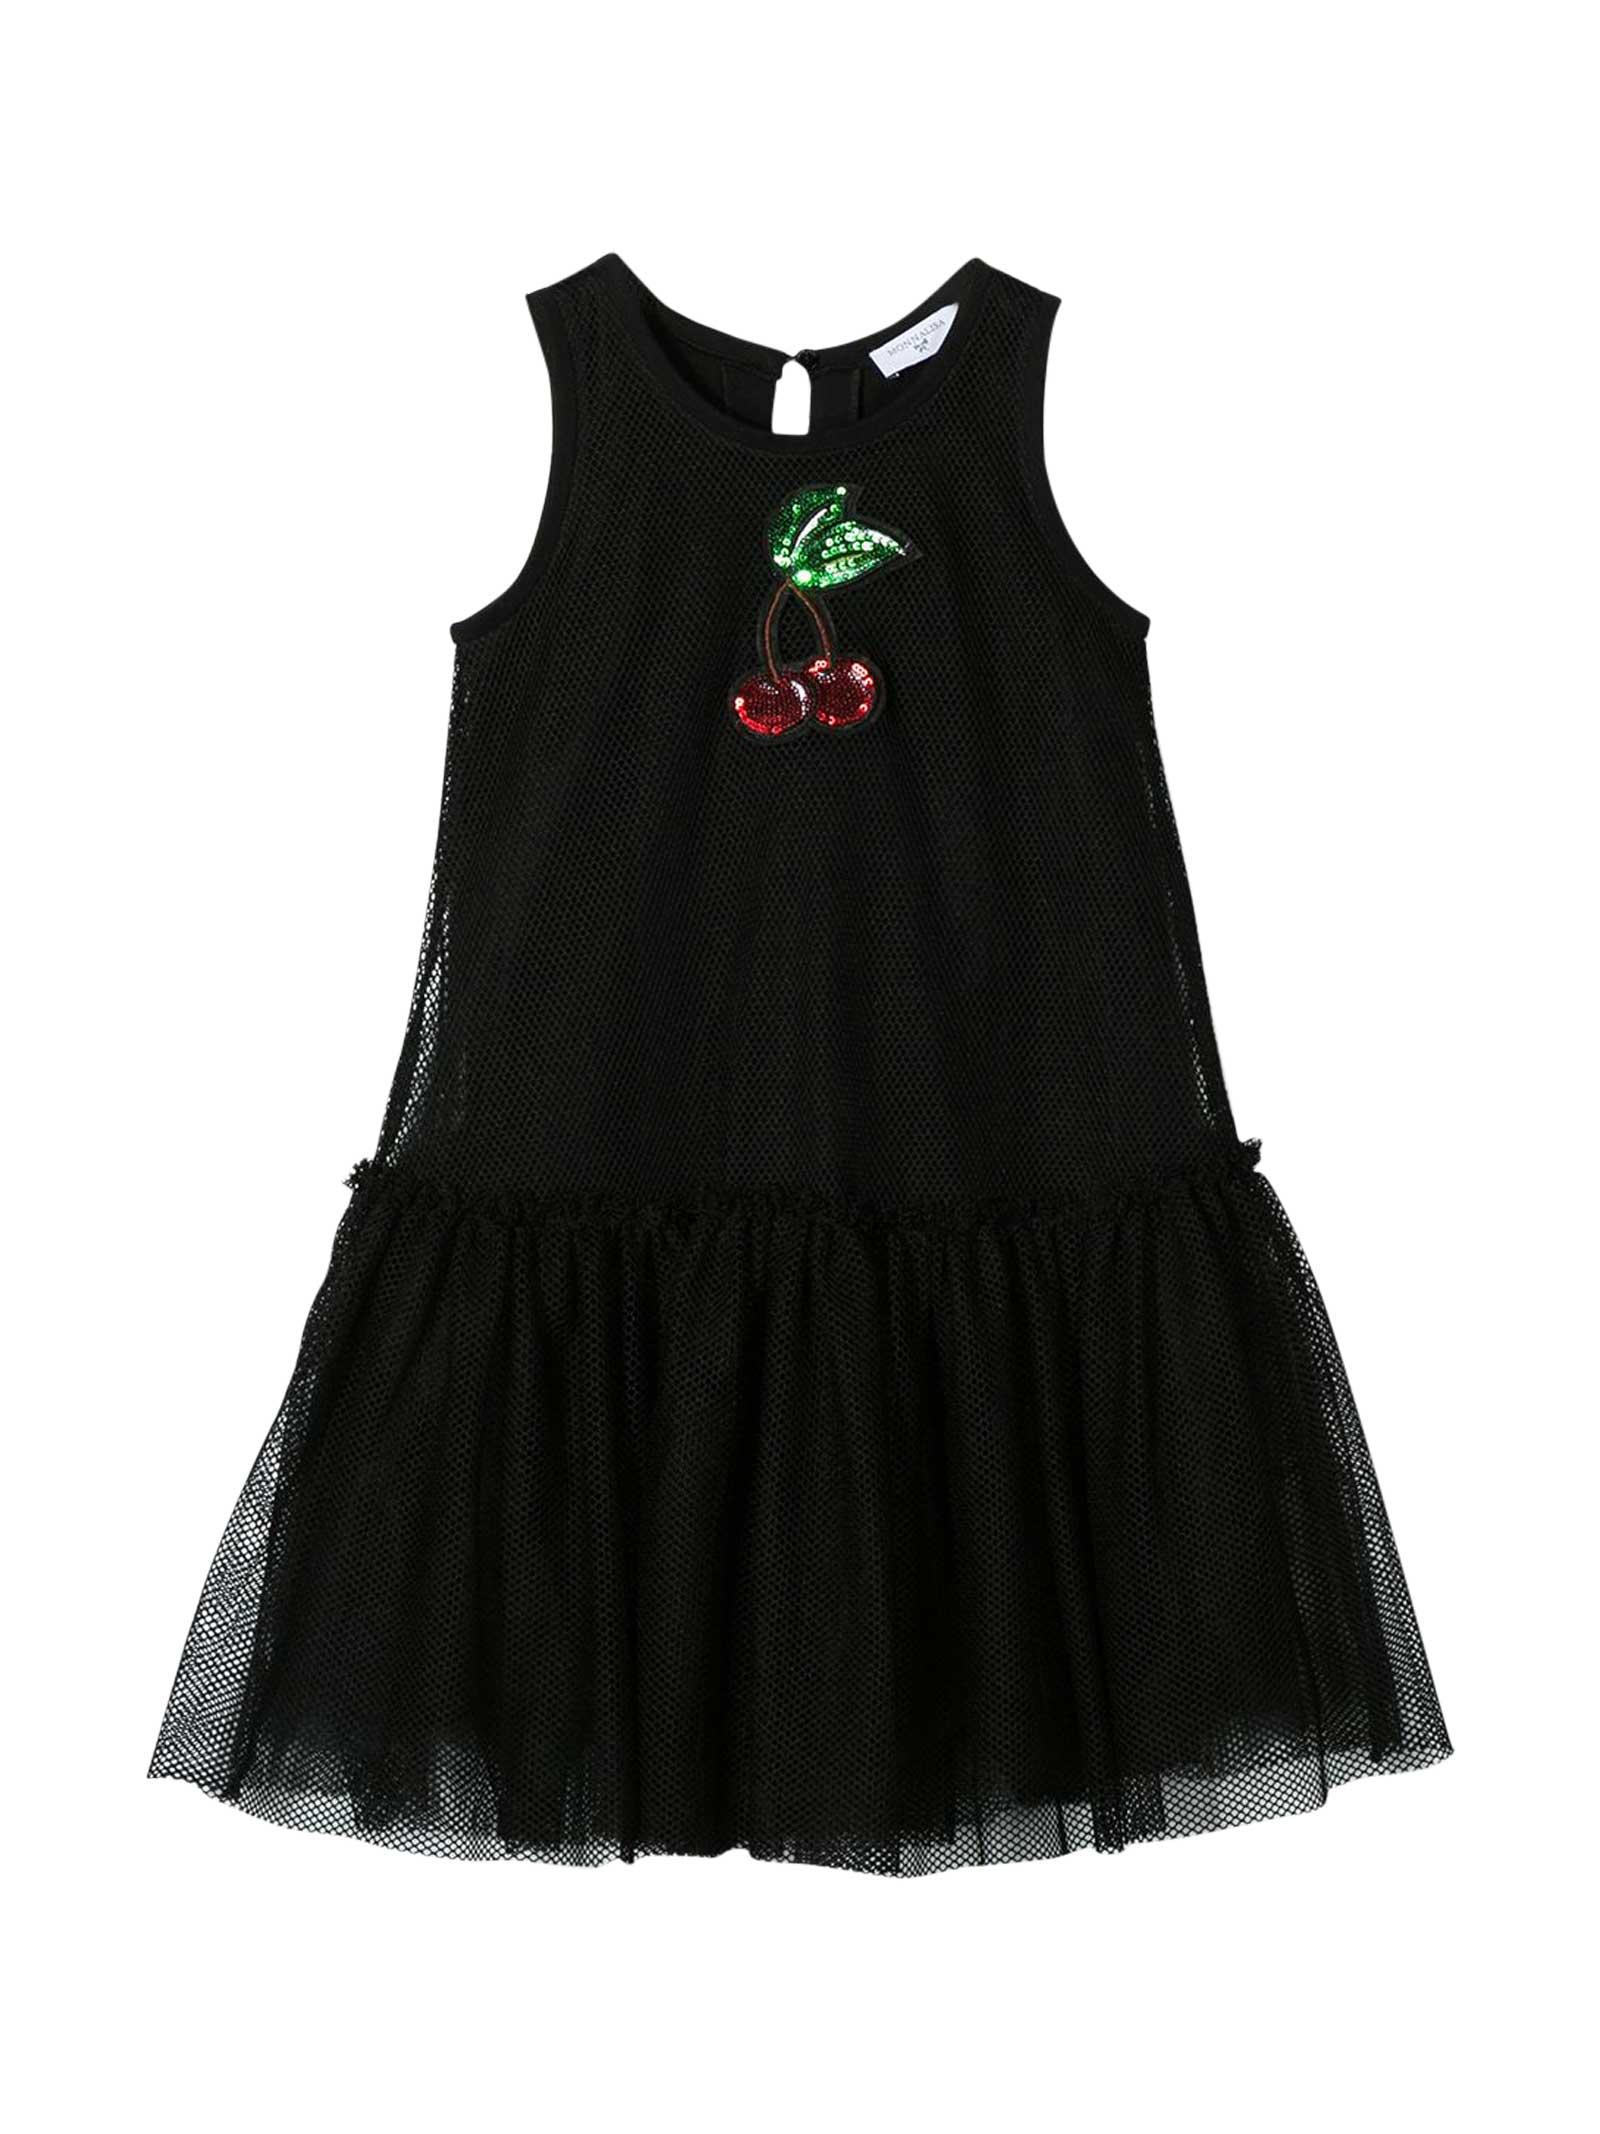 Buy Monnalisa Black Dress With Application online, shop Monnalisa with free shipping